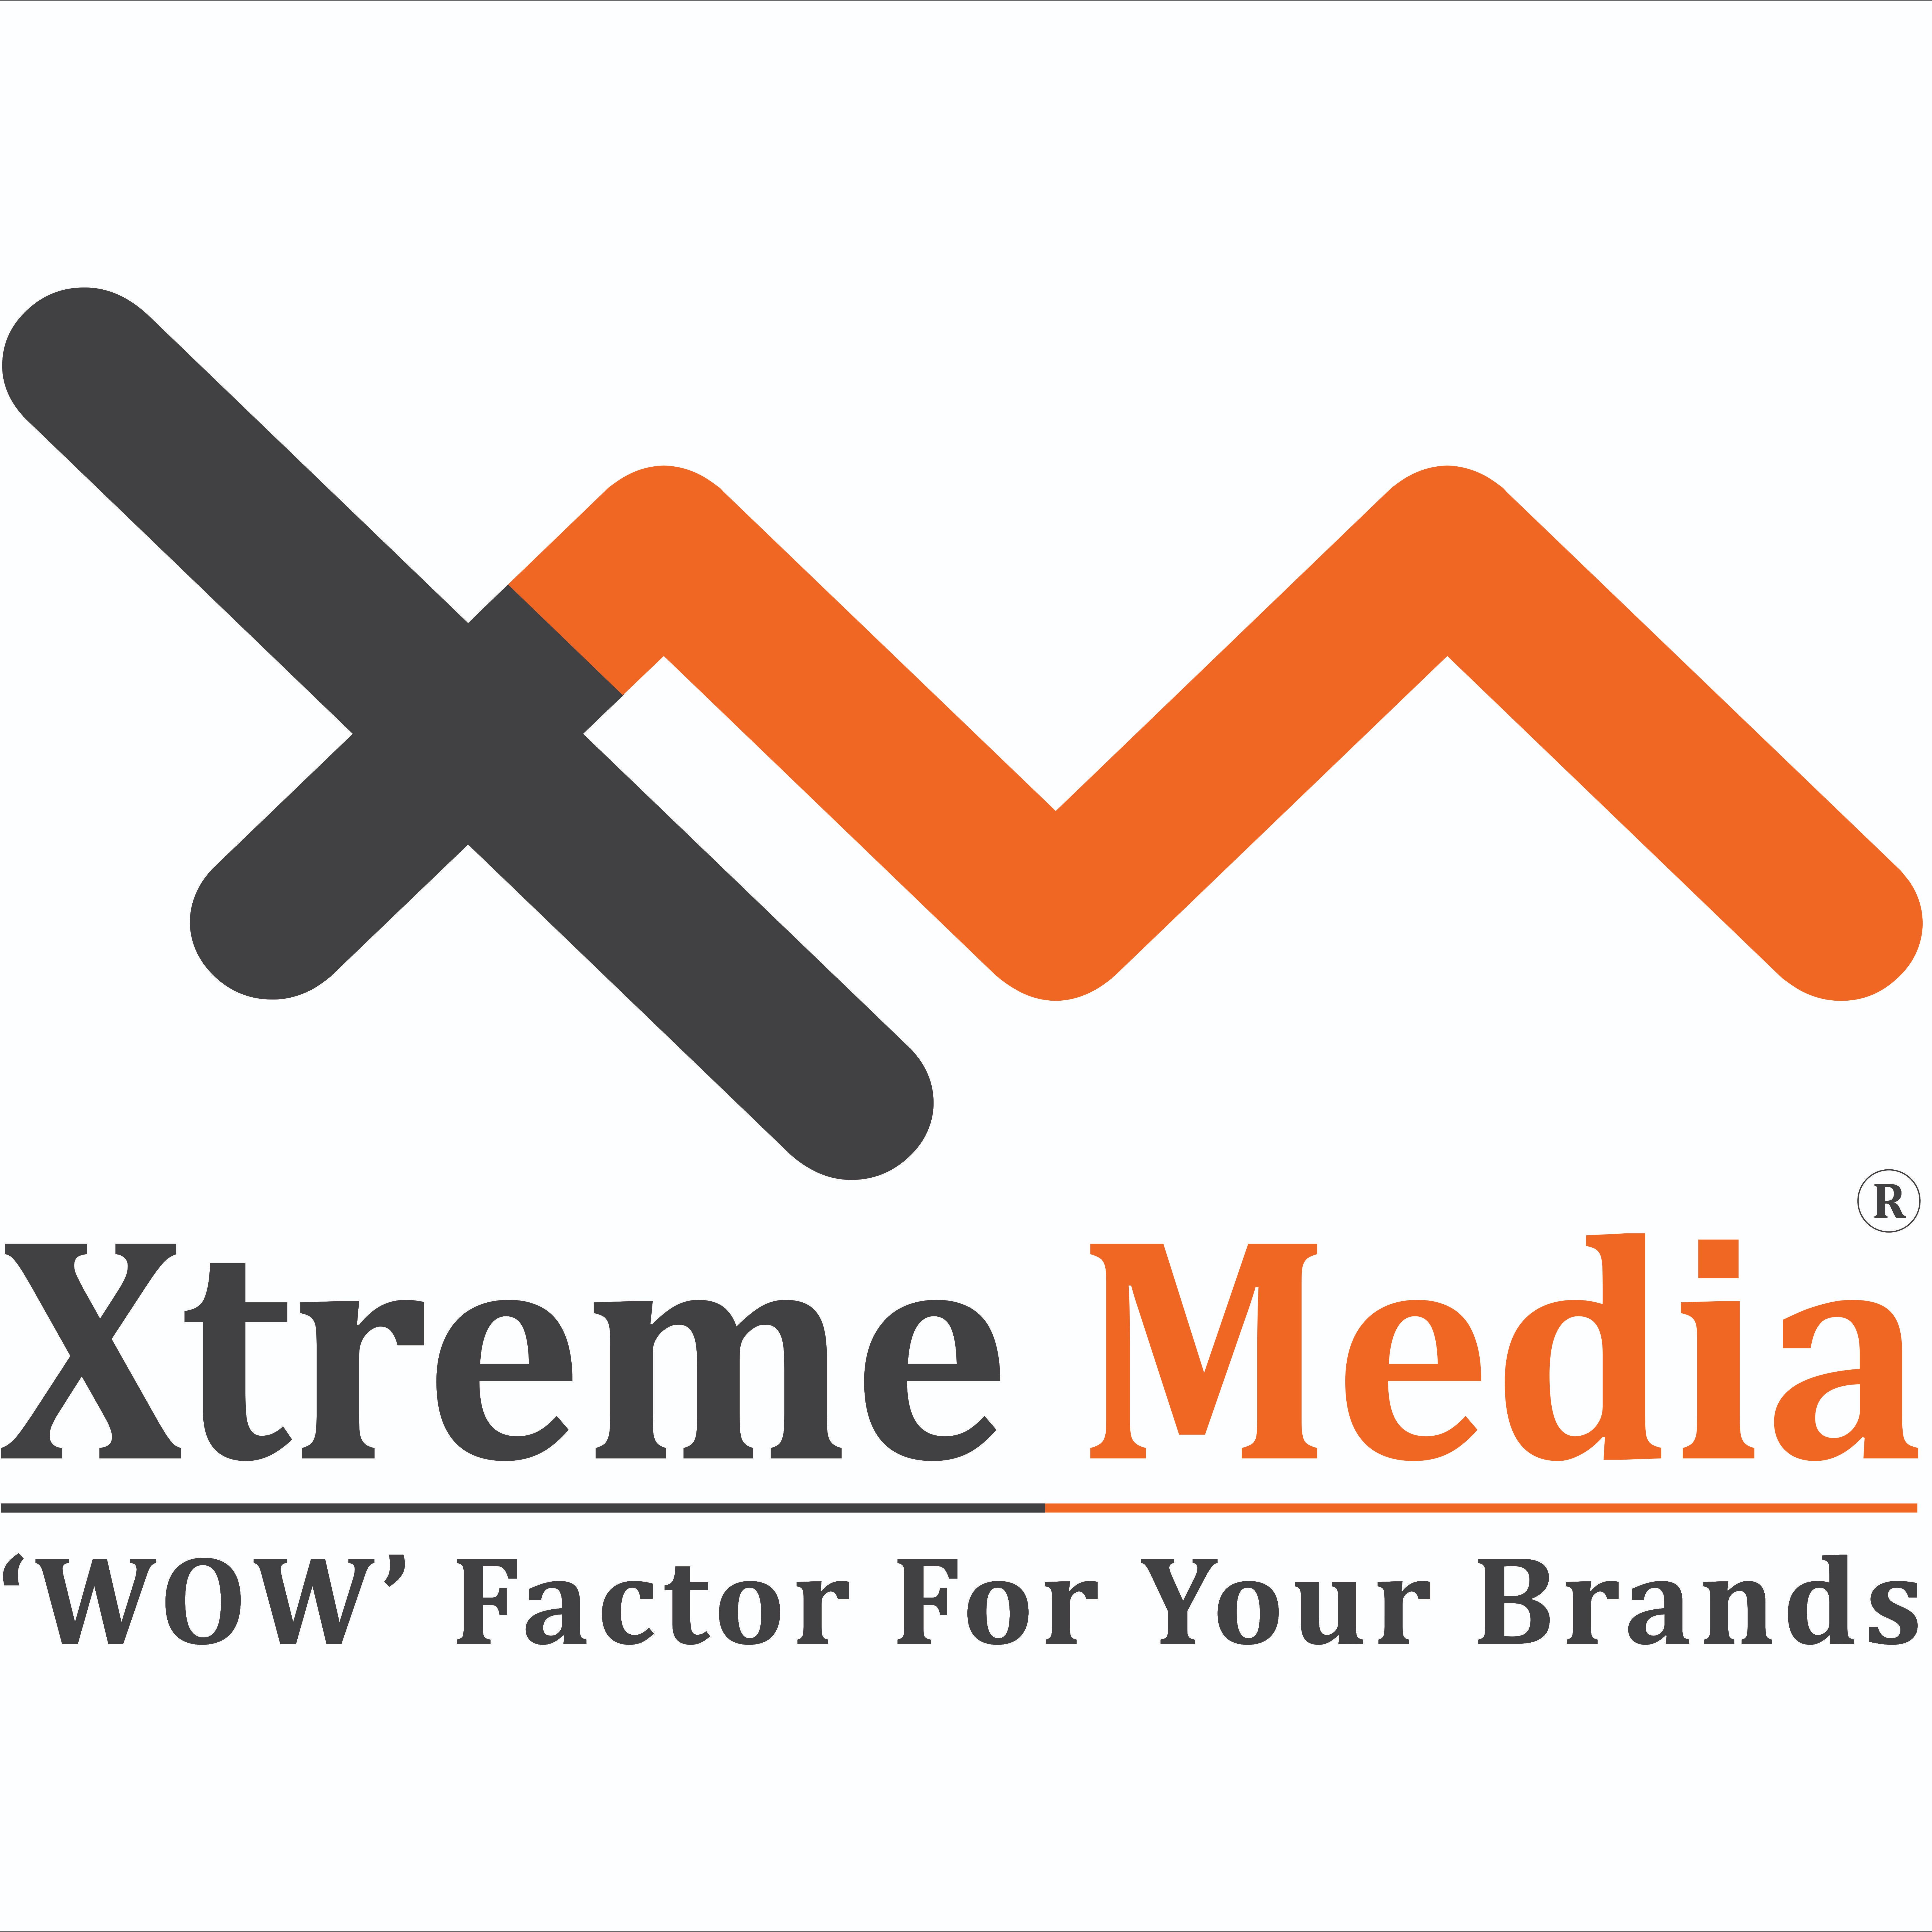 Xtreme Media Digital Signage Reviews, Pricing and Alternatives